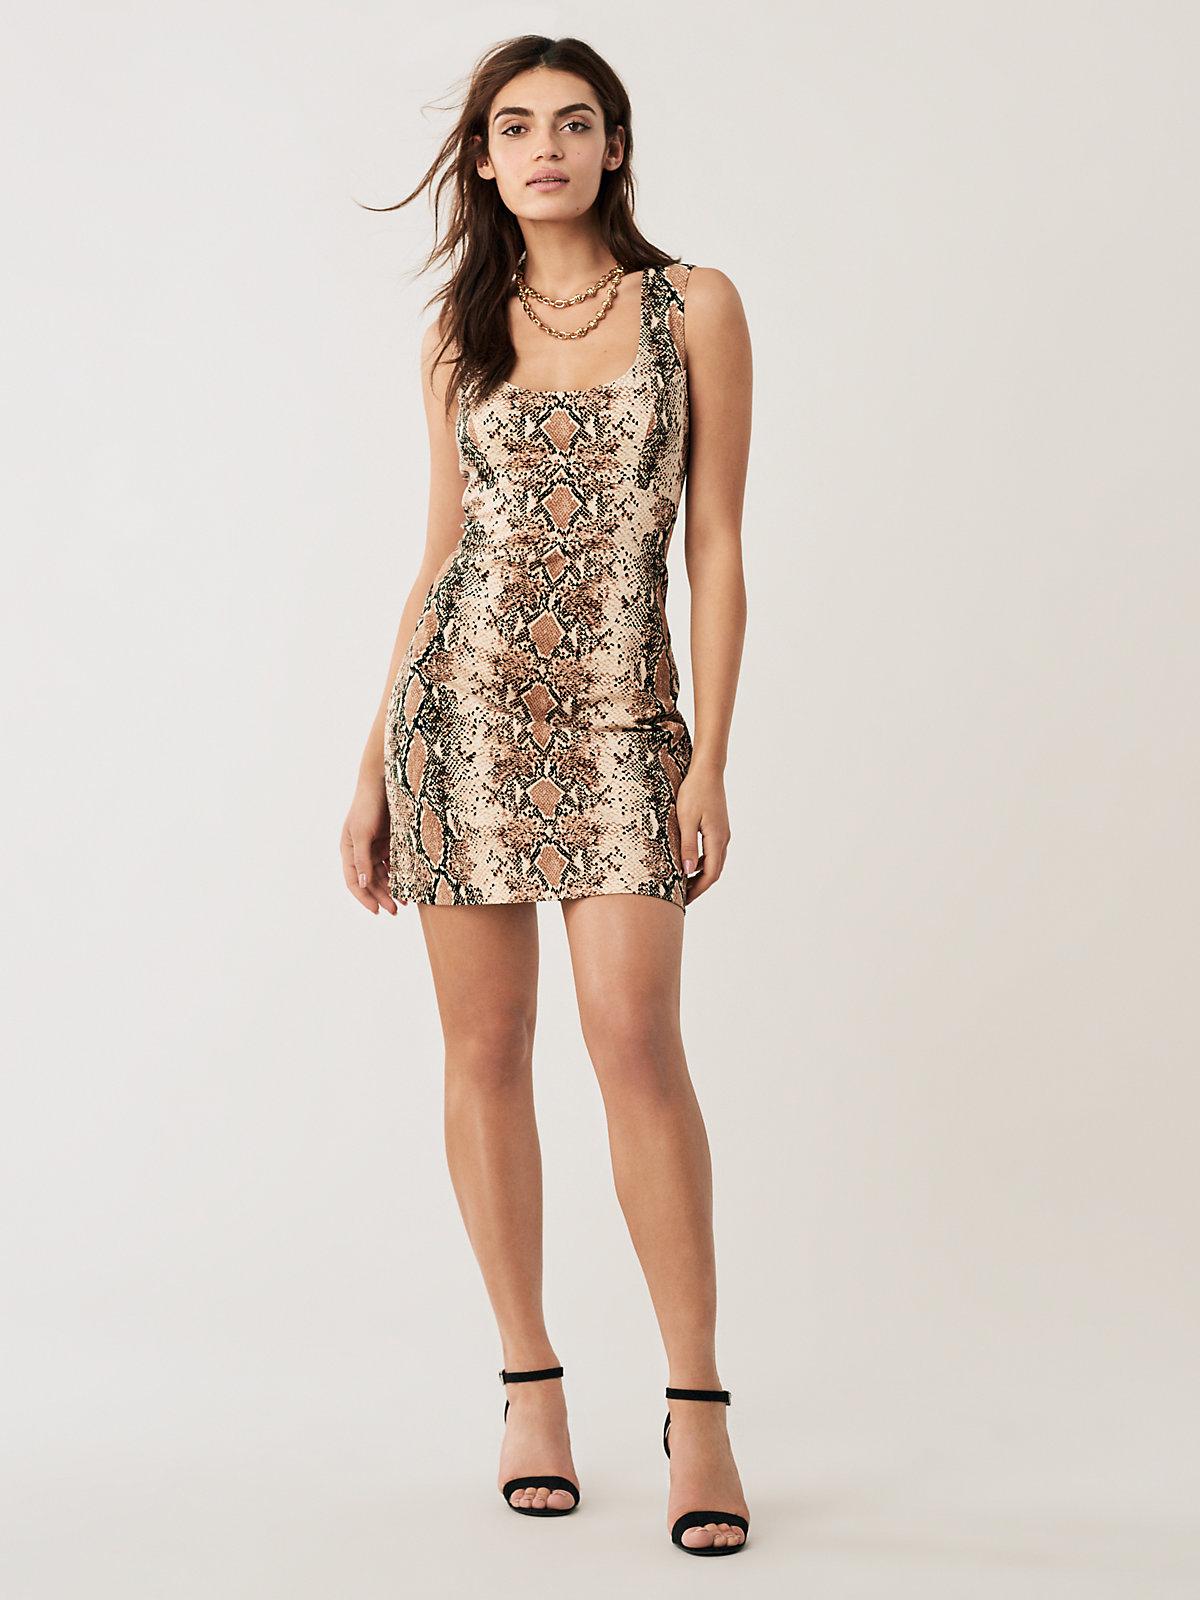 dress-one-pic